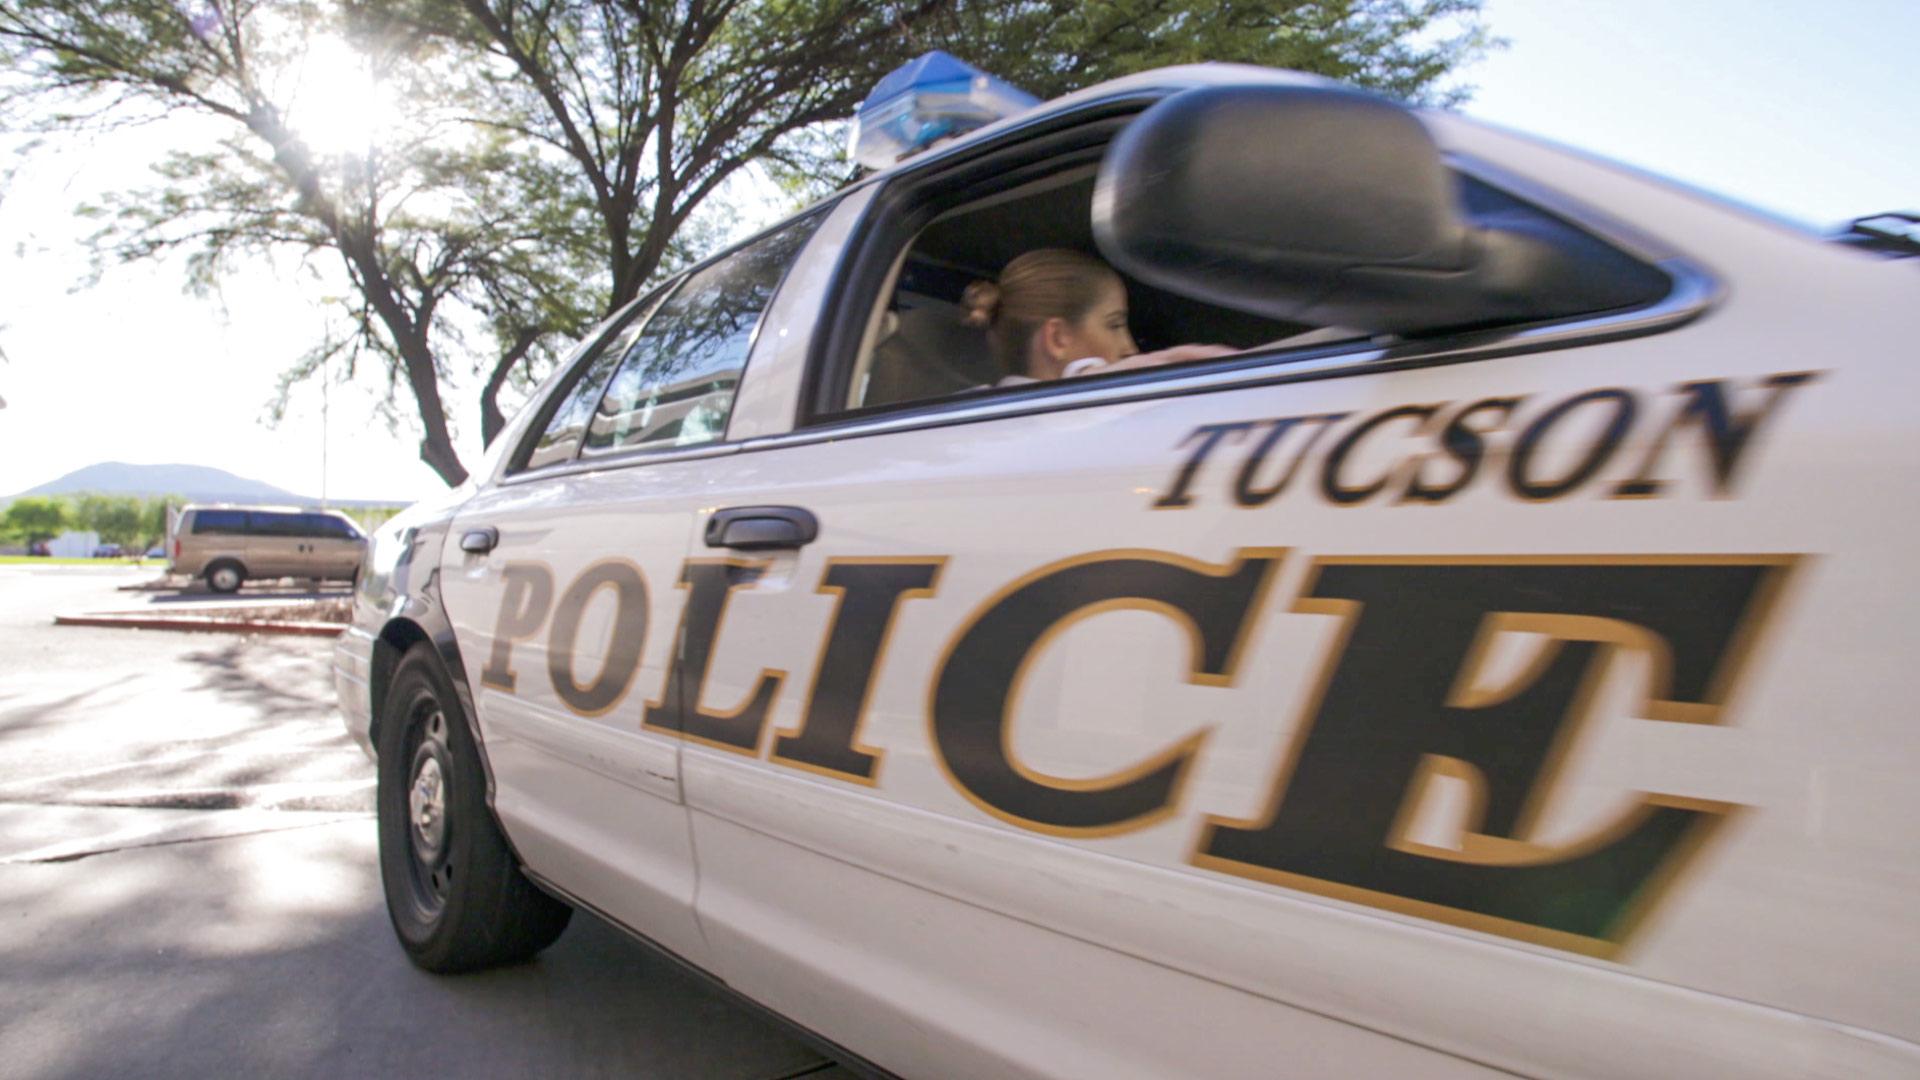 A Tucson Police car.